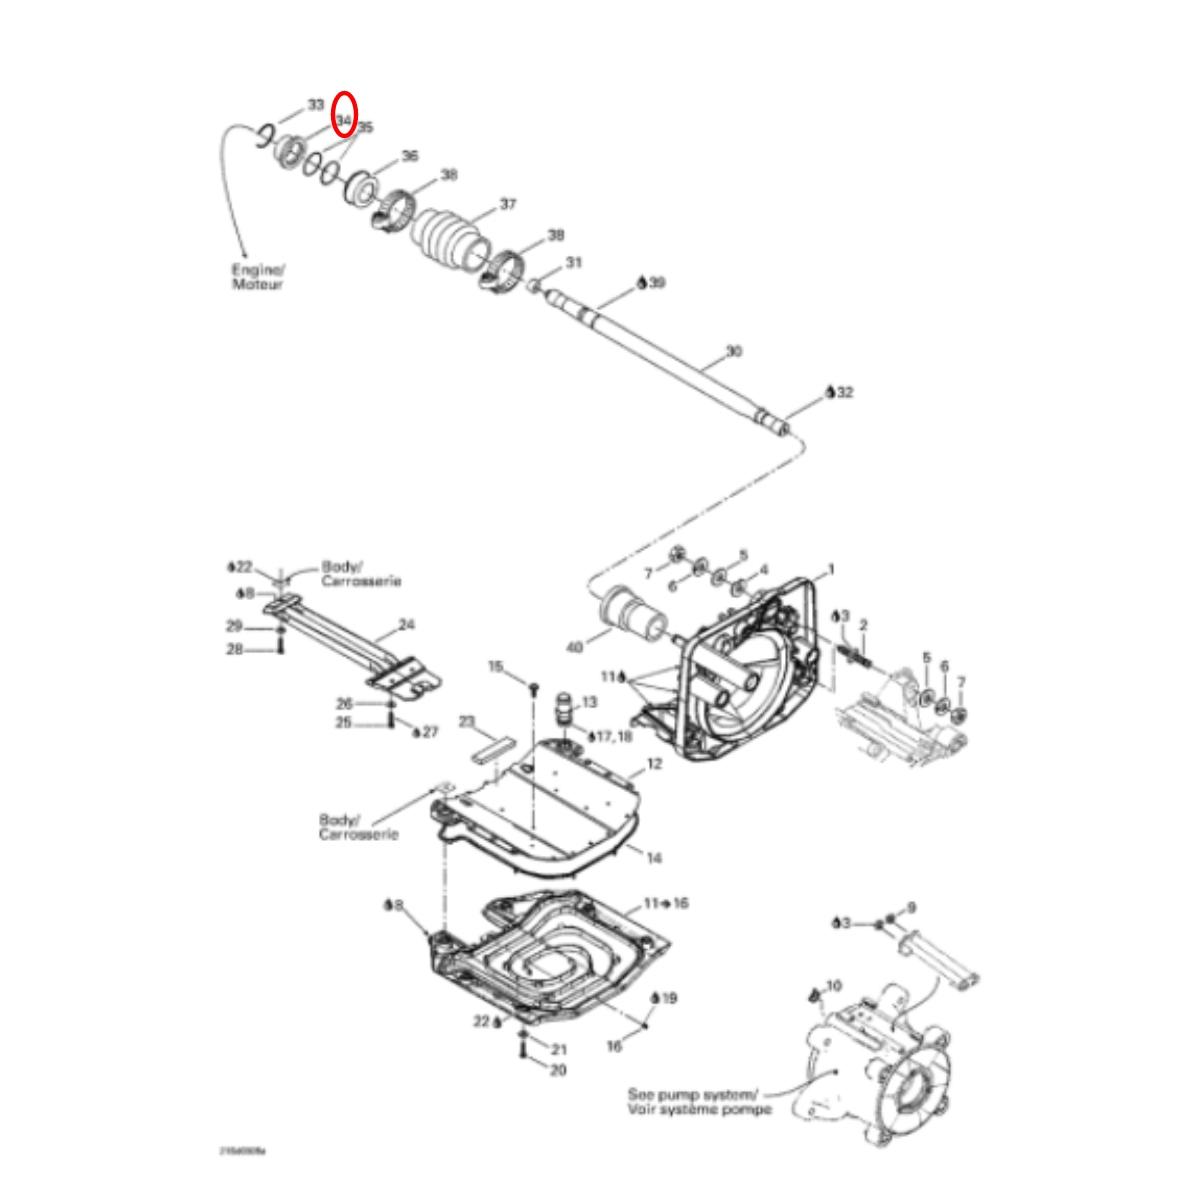 Anel de Carbono Jet Ski Sea Doo RXP/RXT X IS WSM (38 mm)  - Radical Peças - Peças para Jet Ski